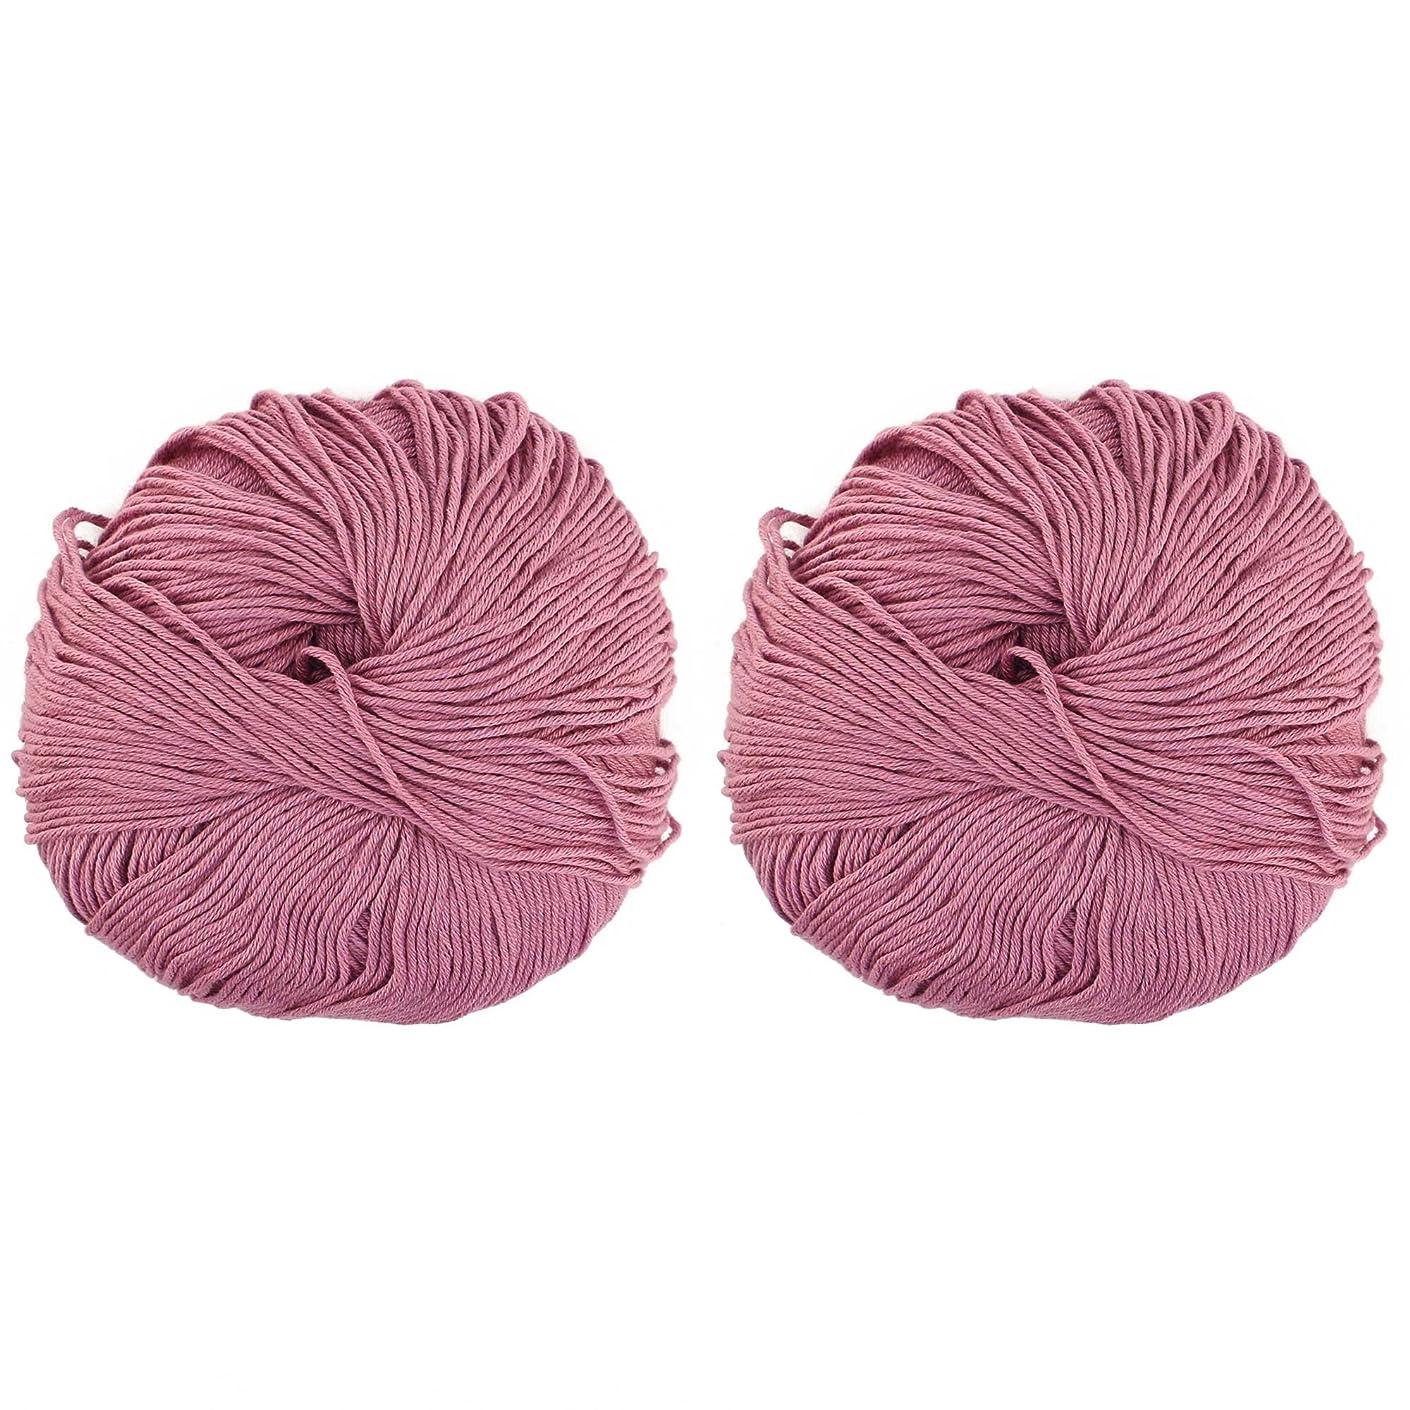 JubileeYarn Bamboo Cotton Blend Sport 4 Ply Yarn - 100g/skein - Cotton Candy - 2 Skeins